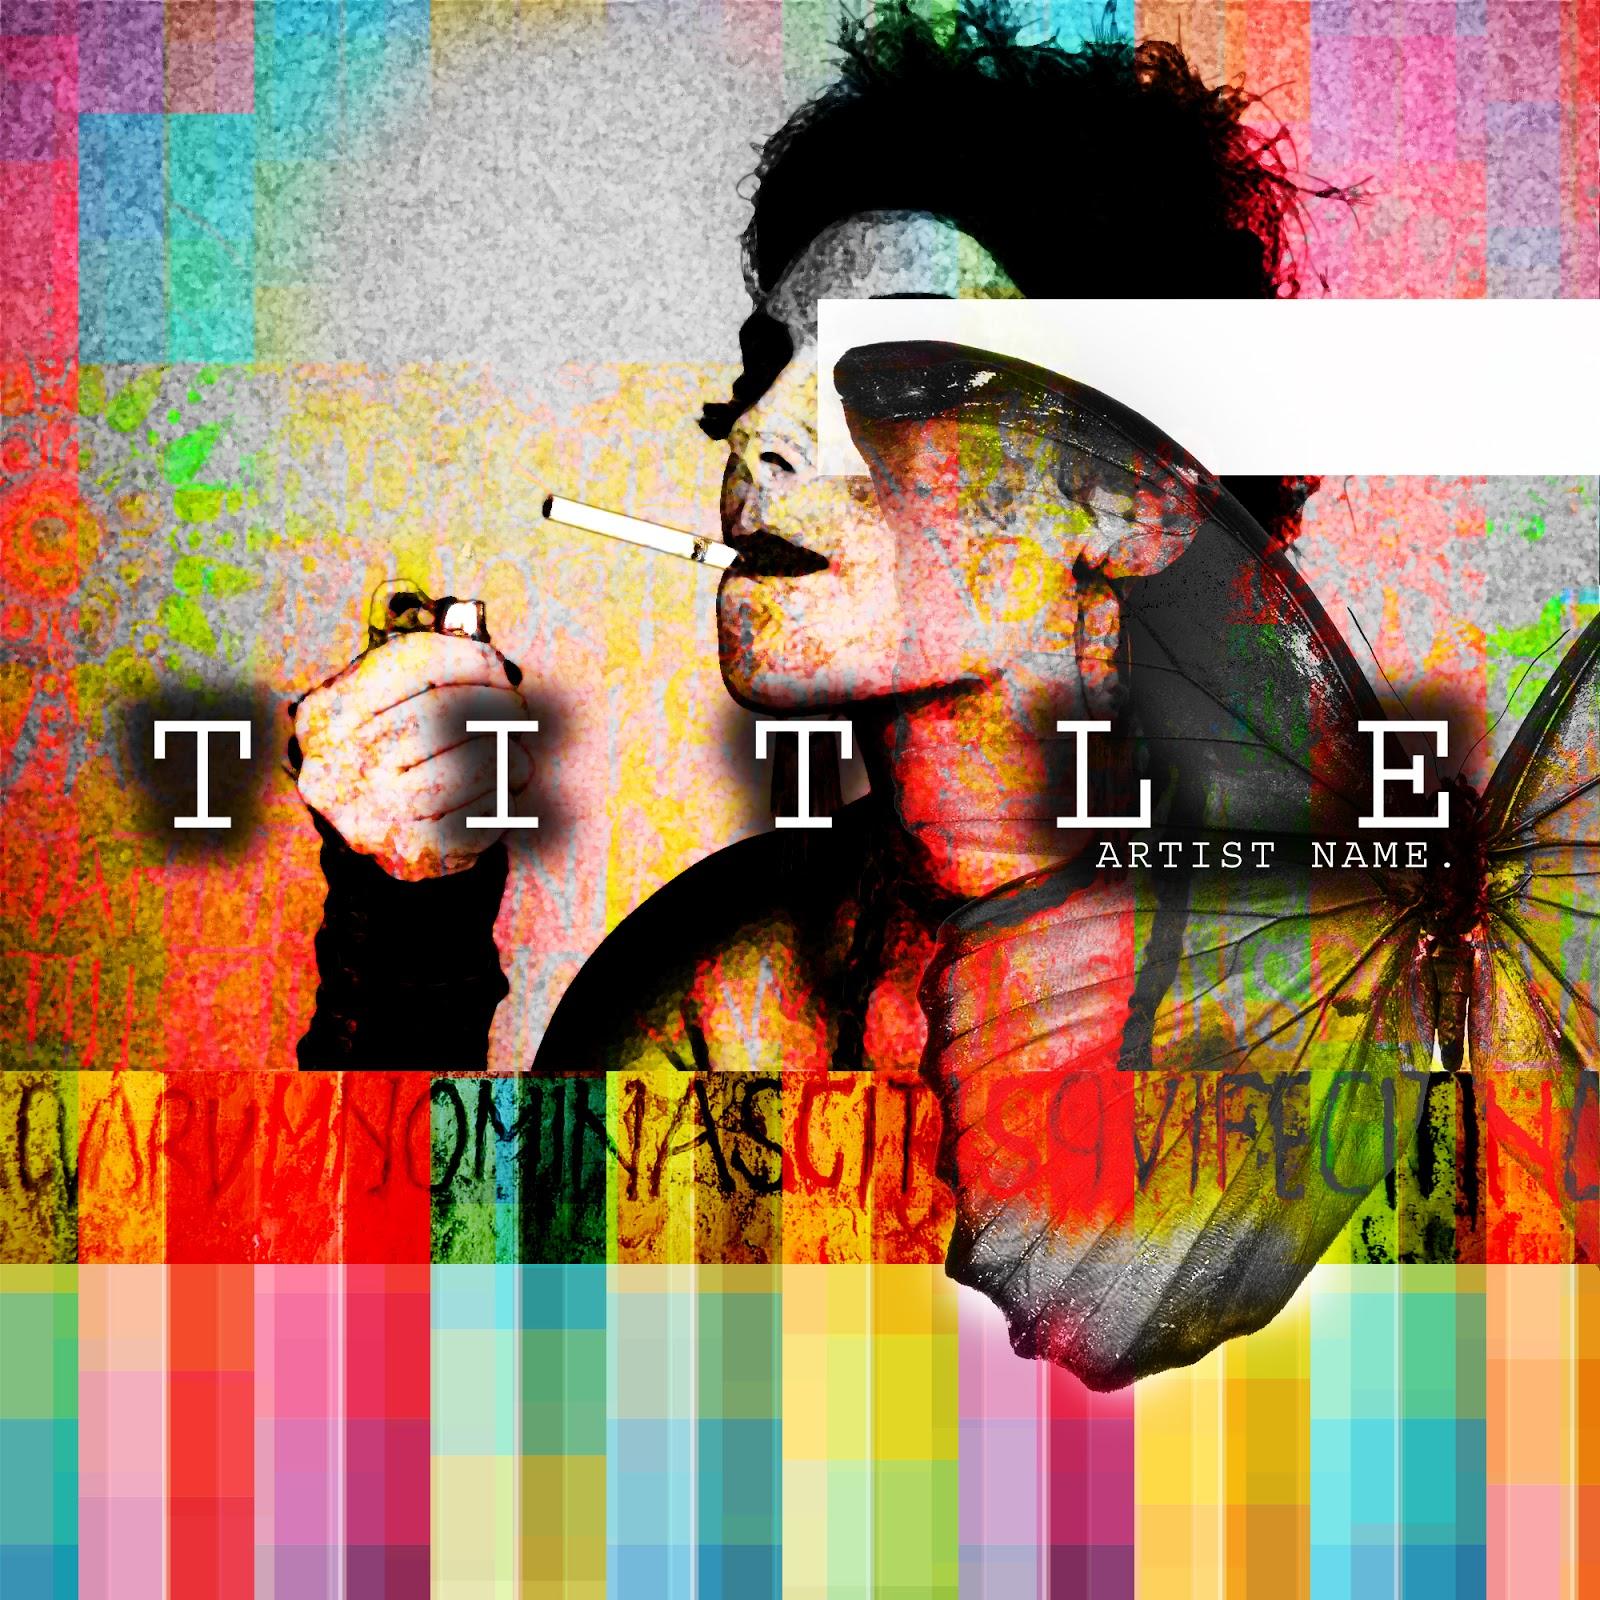 Music Single Album Mixtape Cd Cover Artwork Graphic Design Templates,Custom Pools By Design